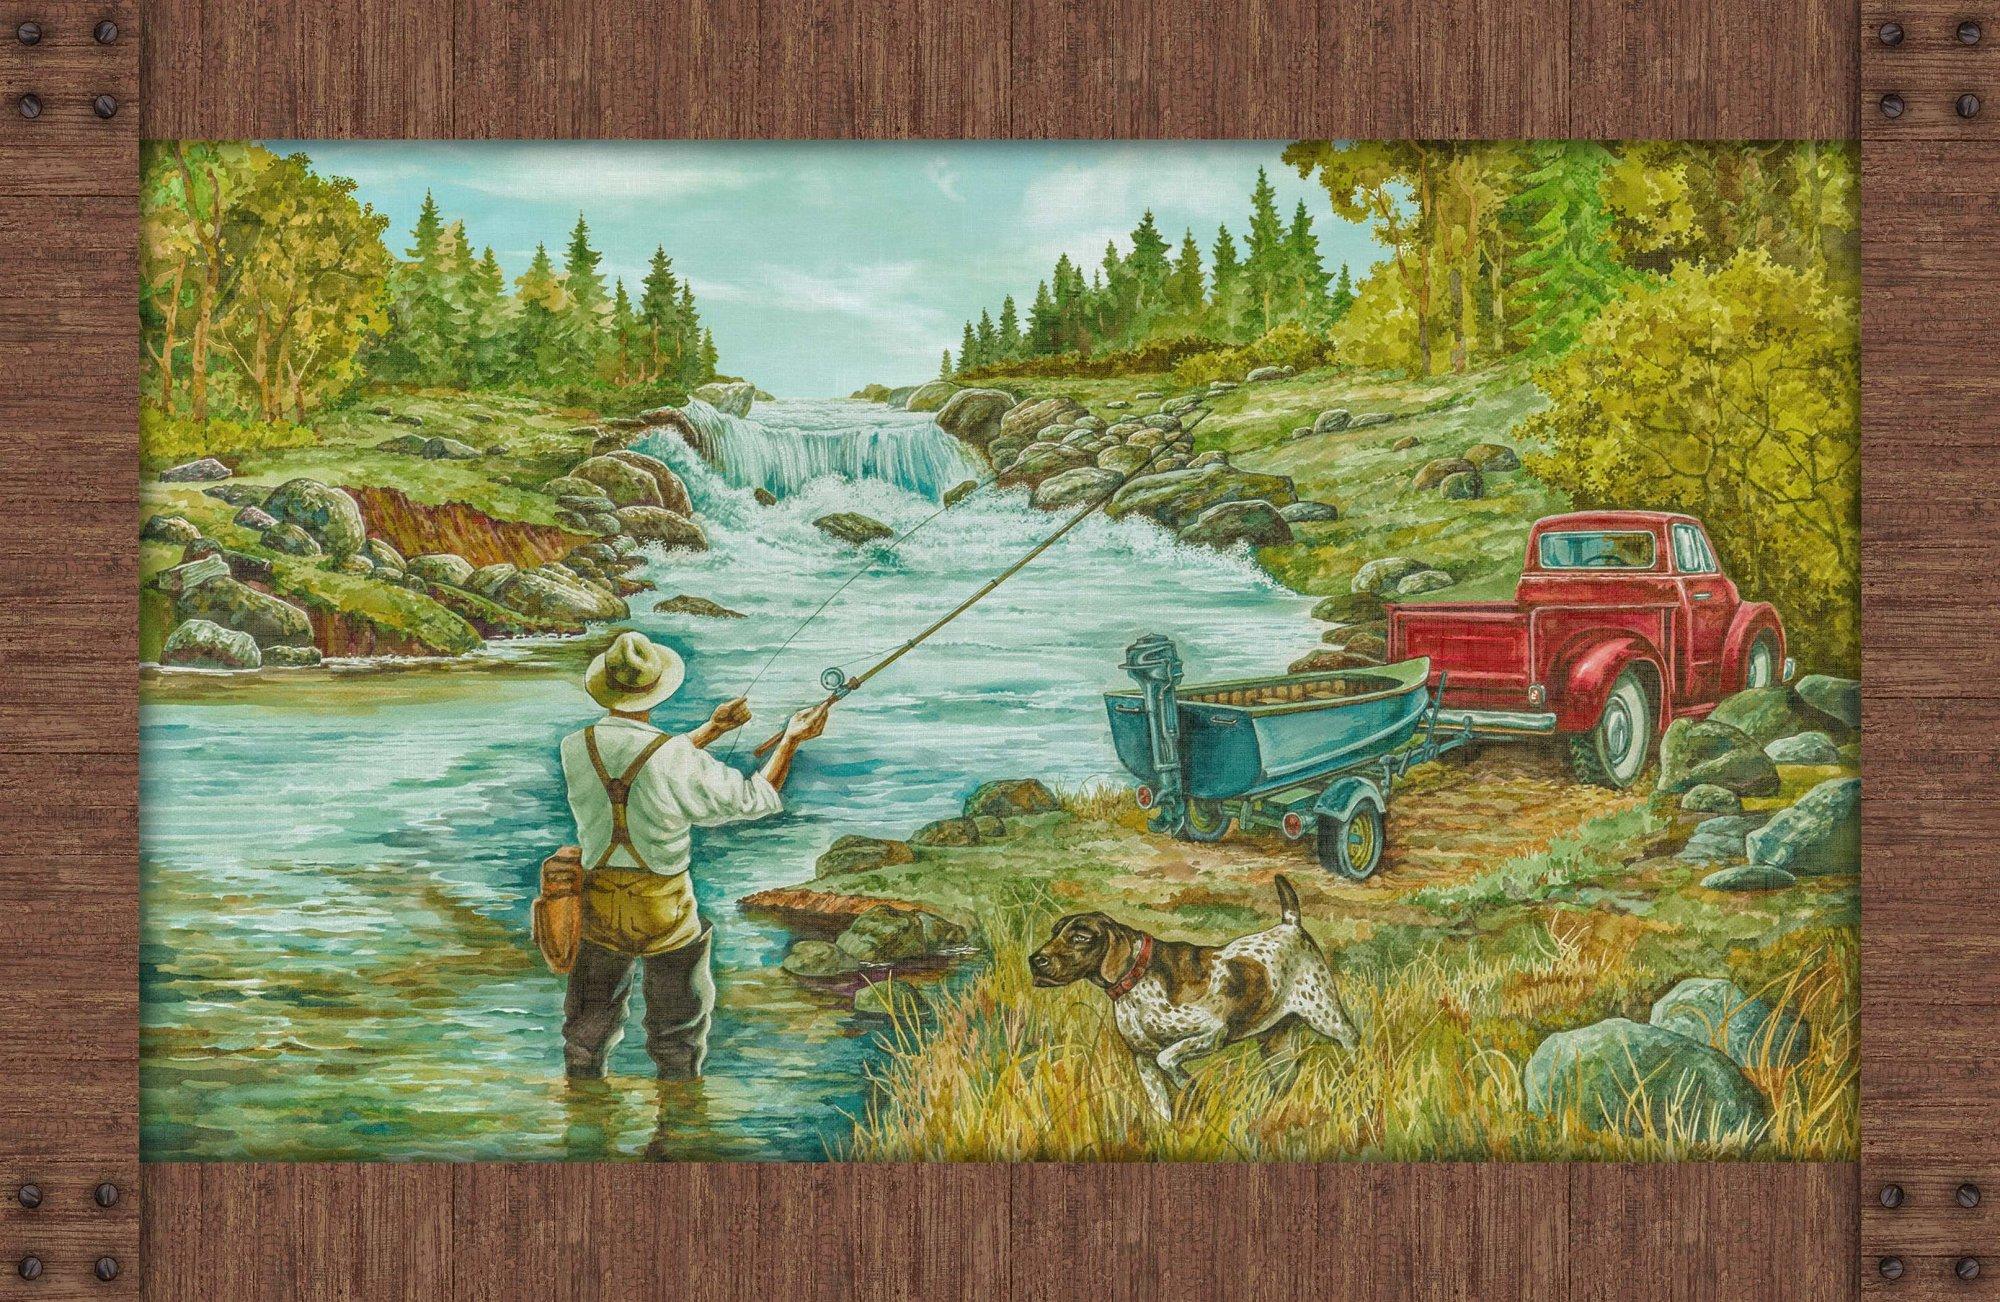 Rod and Reel Panel (Digital) ~28x43  #19